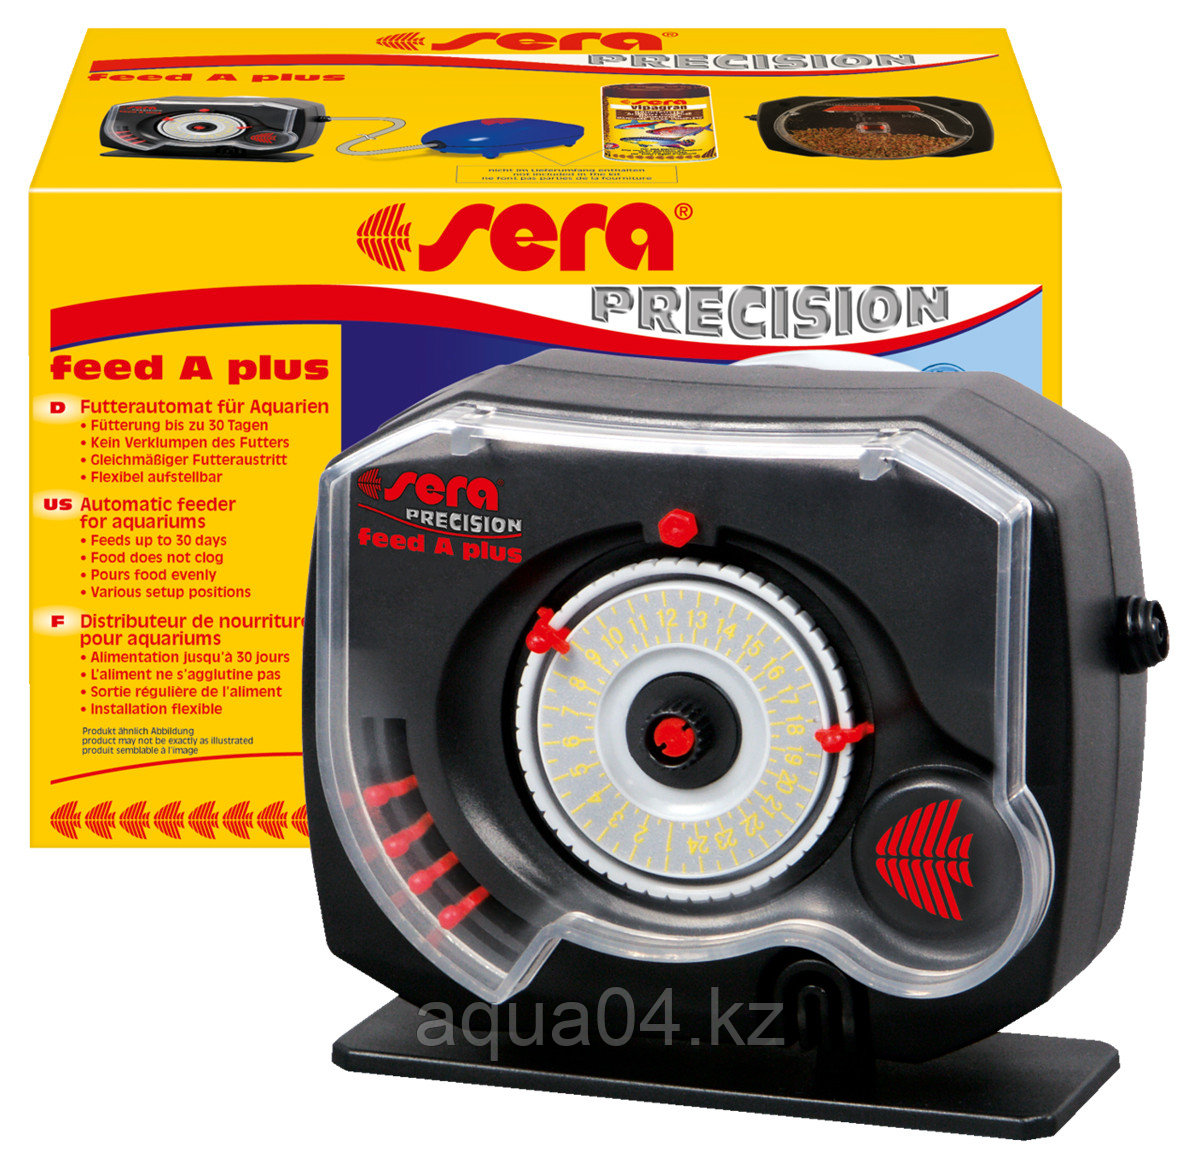 SERA feed A plus (Автоматическая кормушка)